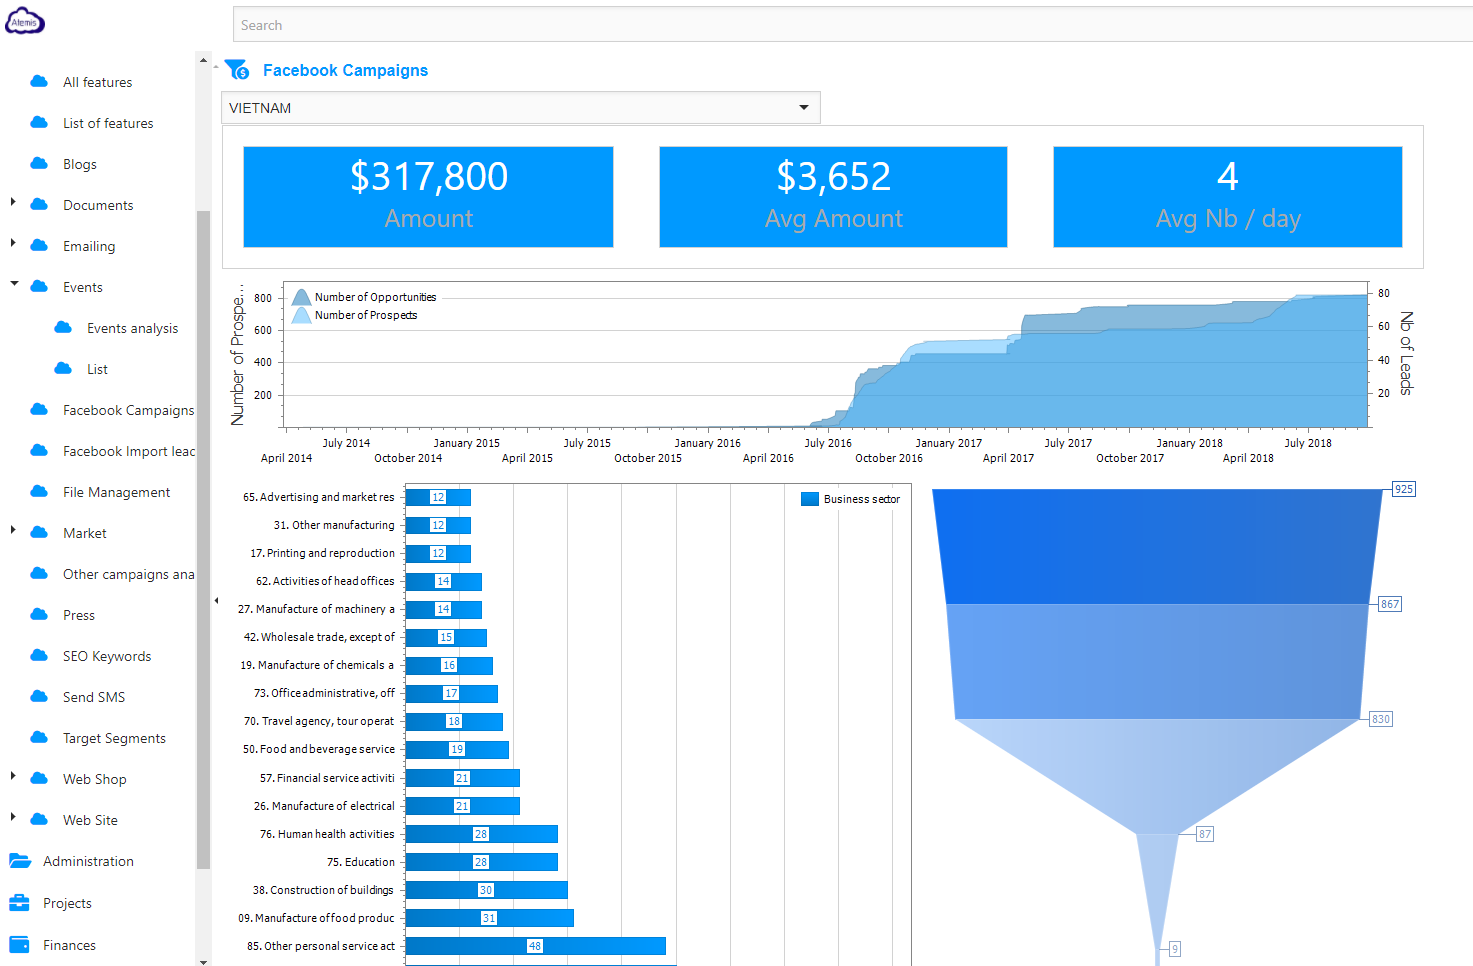 AtemisCloud | 2.Marketing | Facebook | Campaigns dashboard